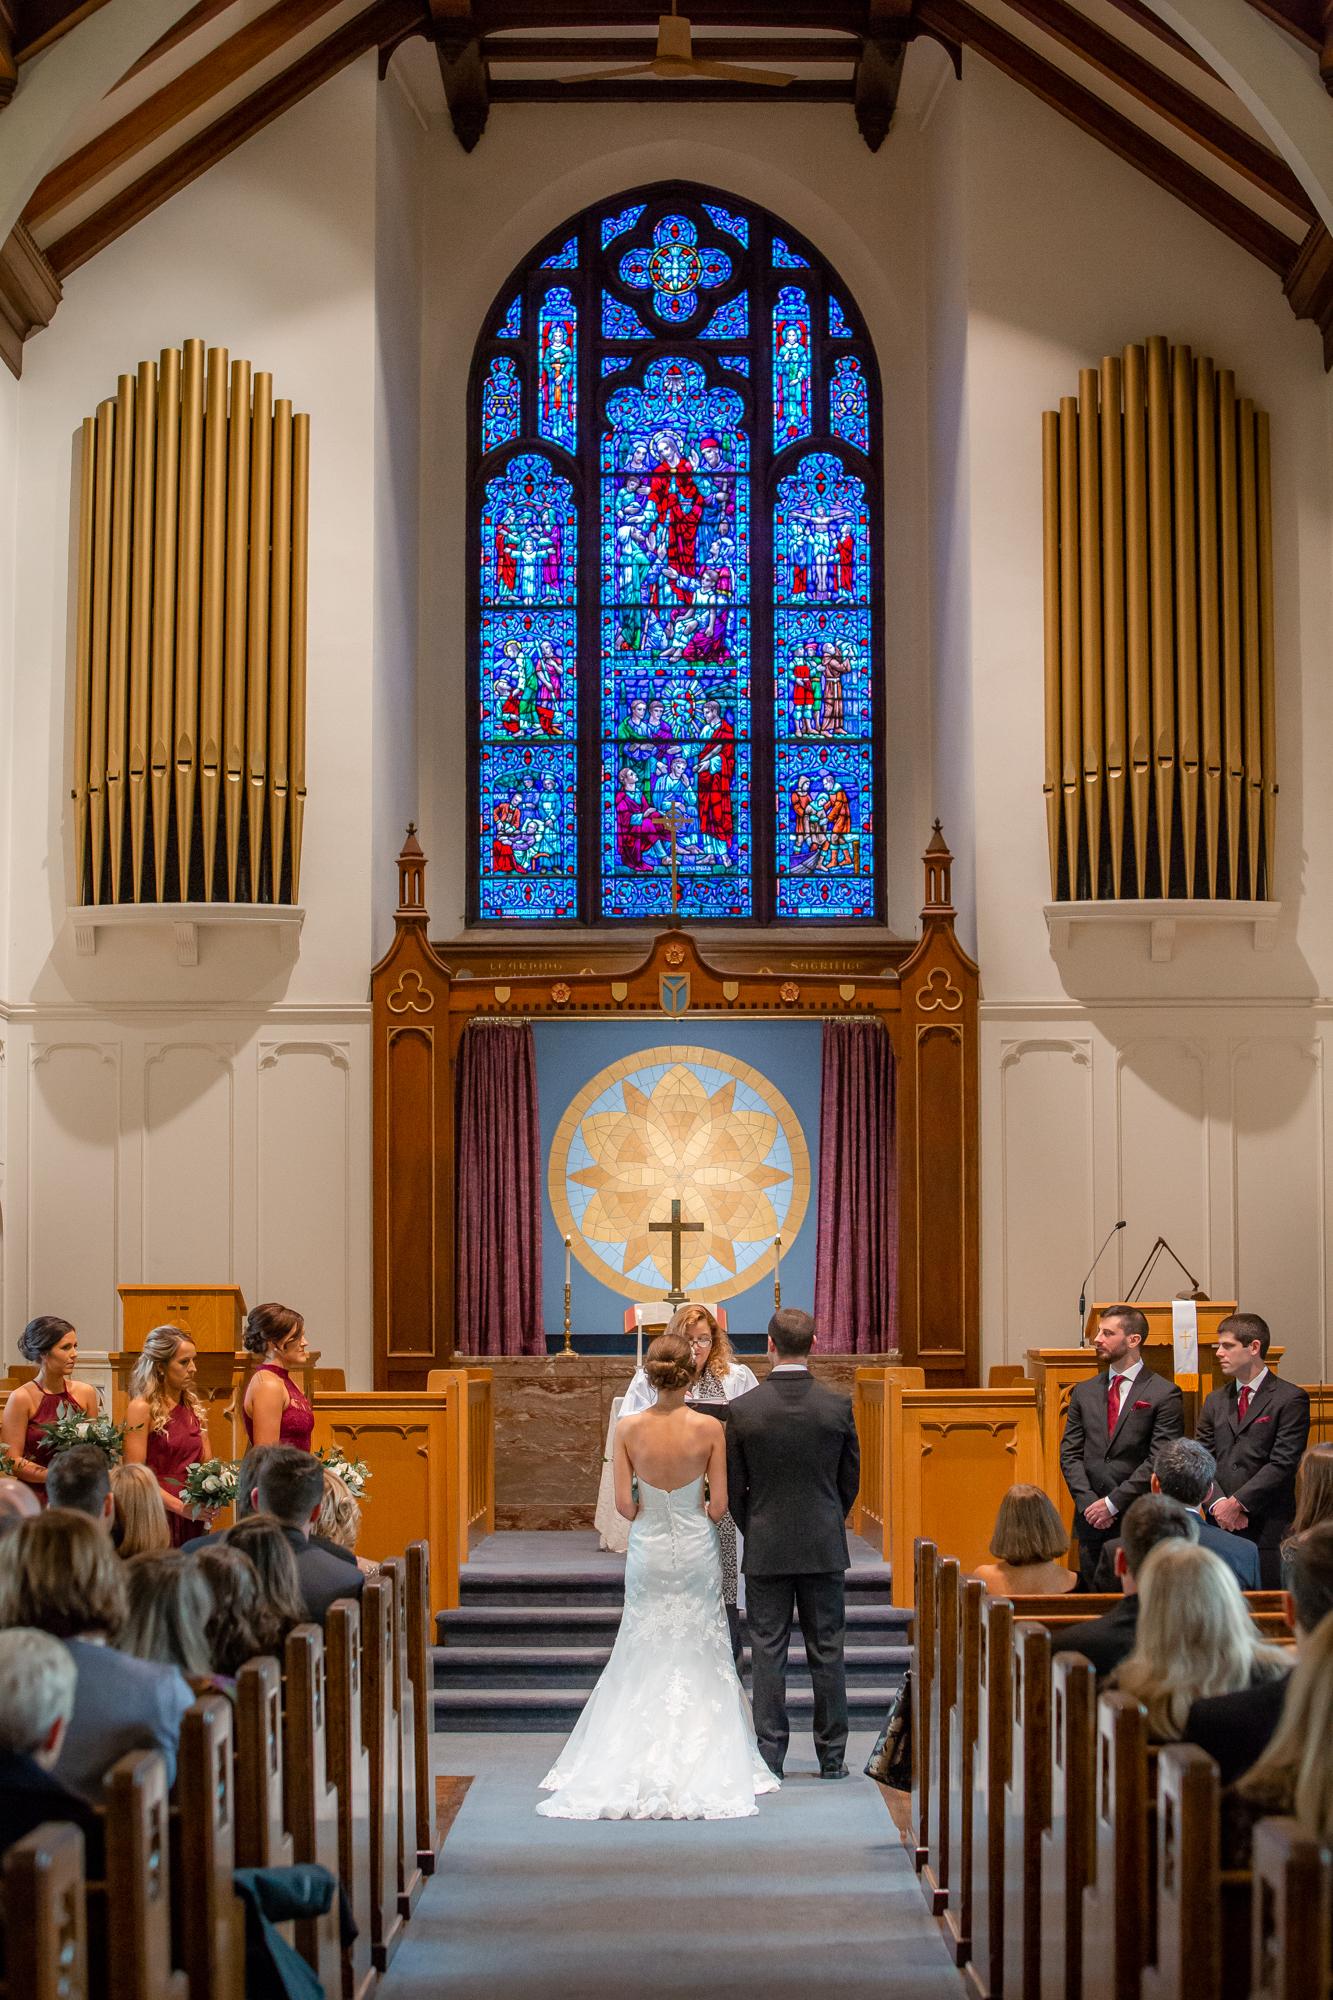 Harro-East-Theatre-and-Ballroom-wedding-7542.jpg